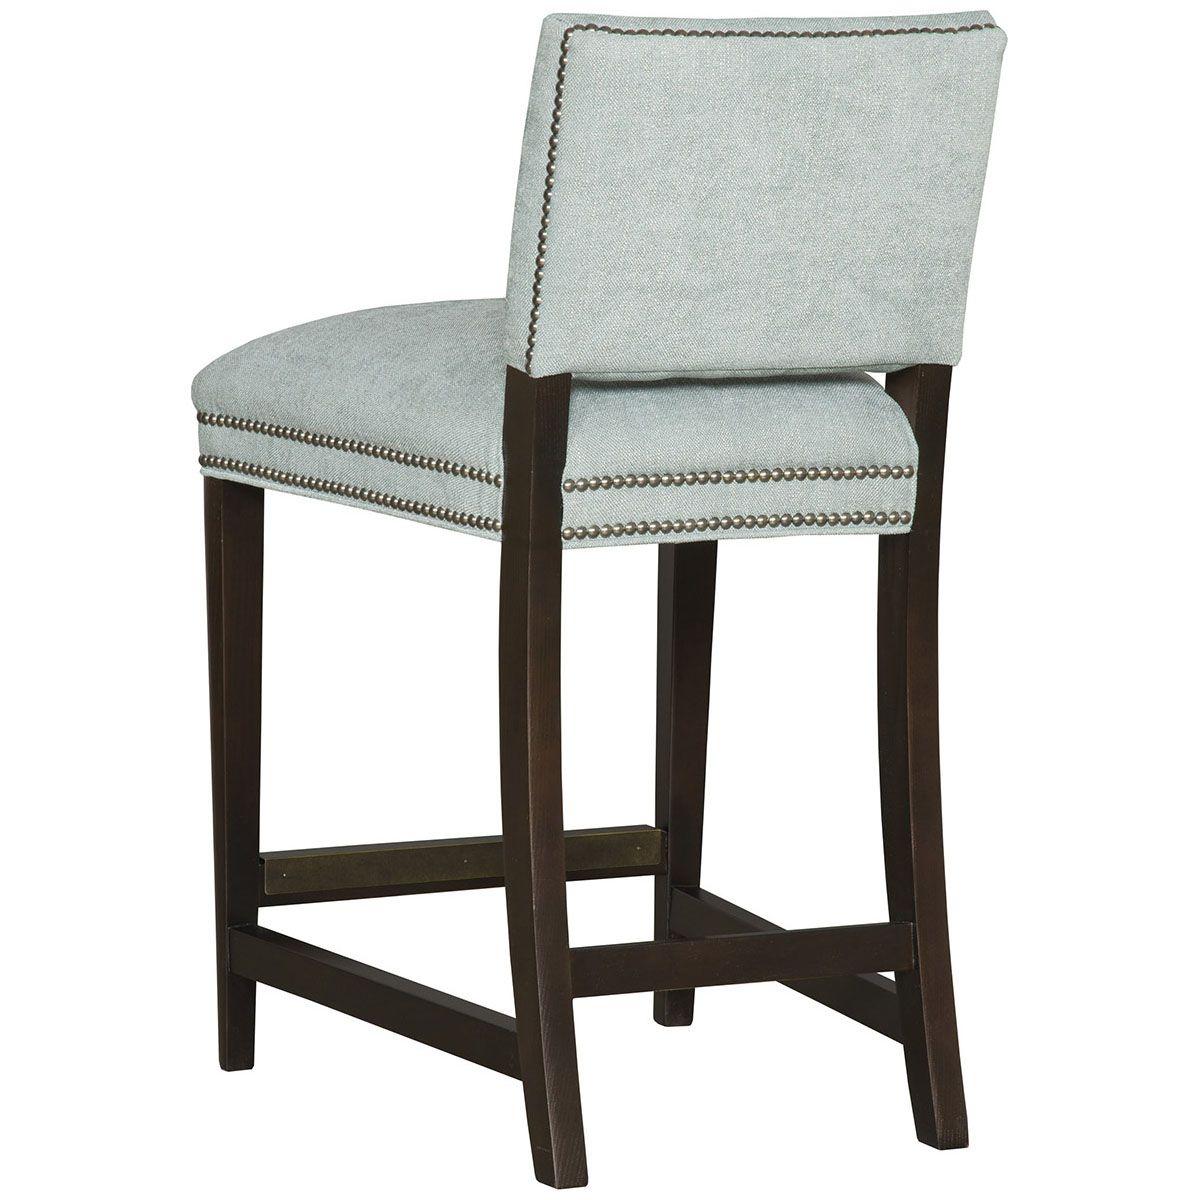 Vanguard Furniture Newton Counter Stool W709-CS-550331 | Vanguad ...